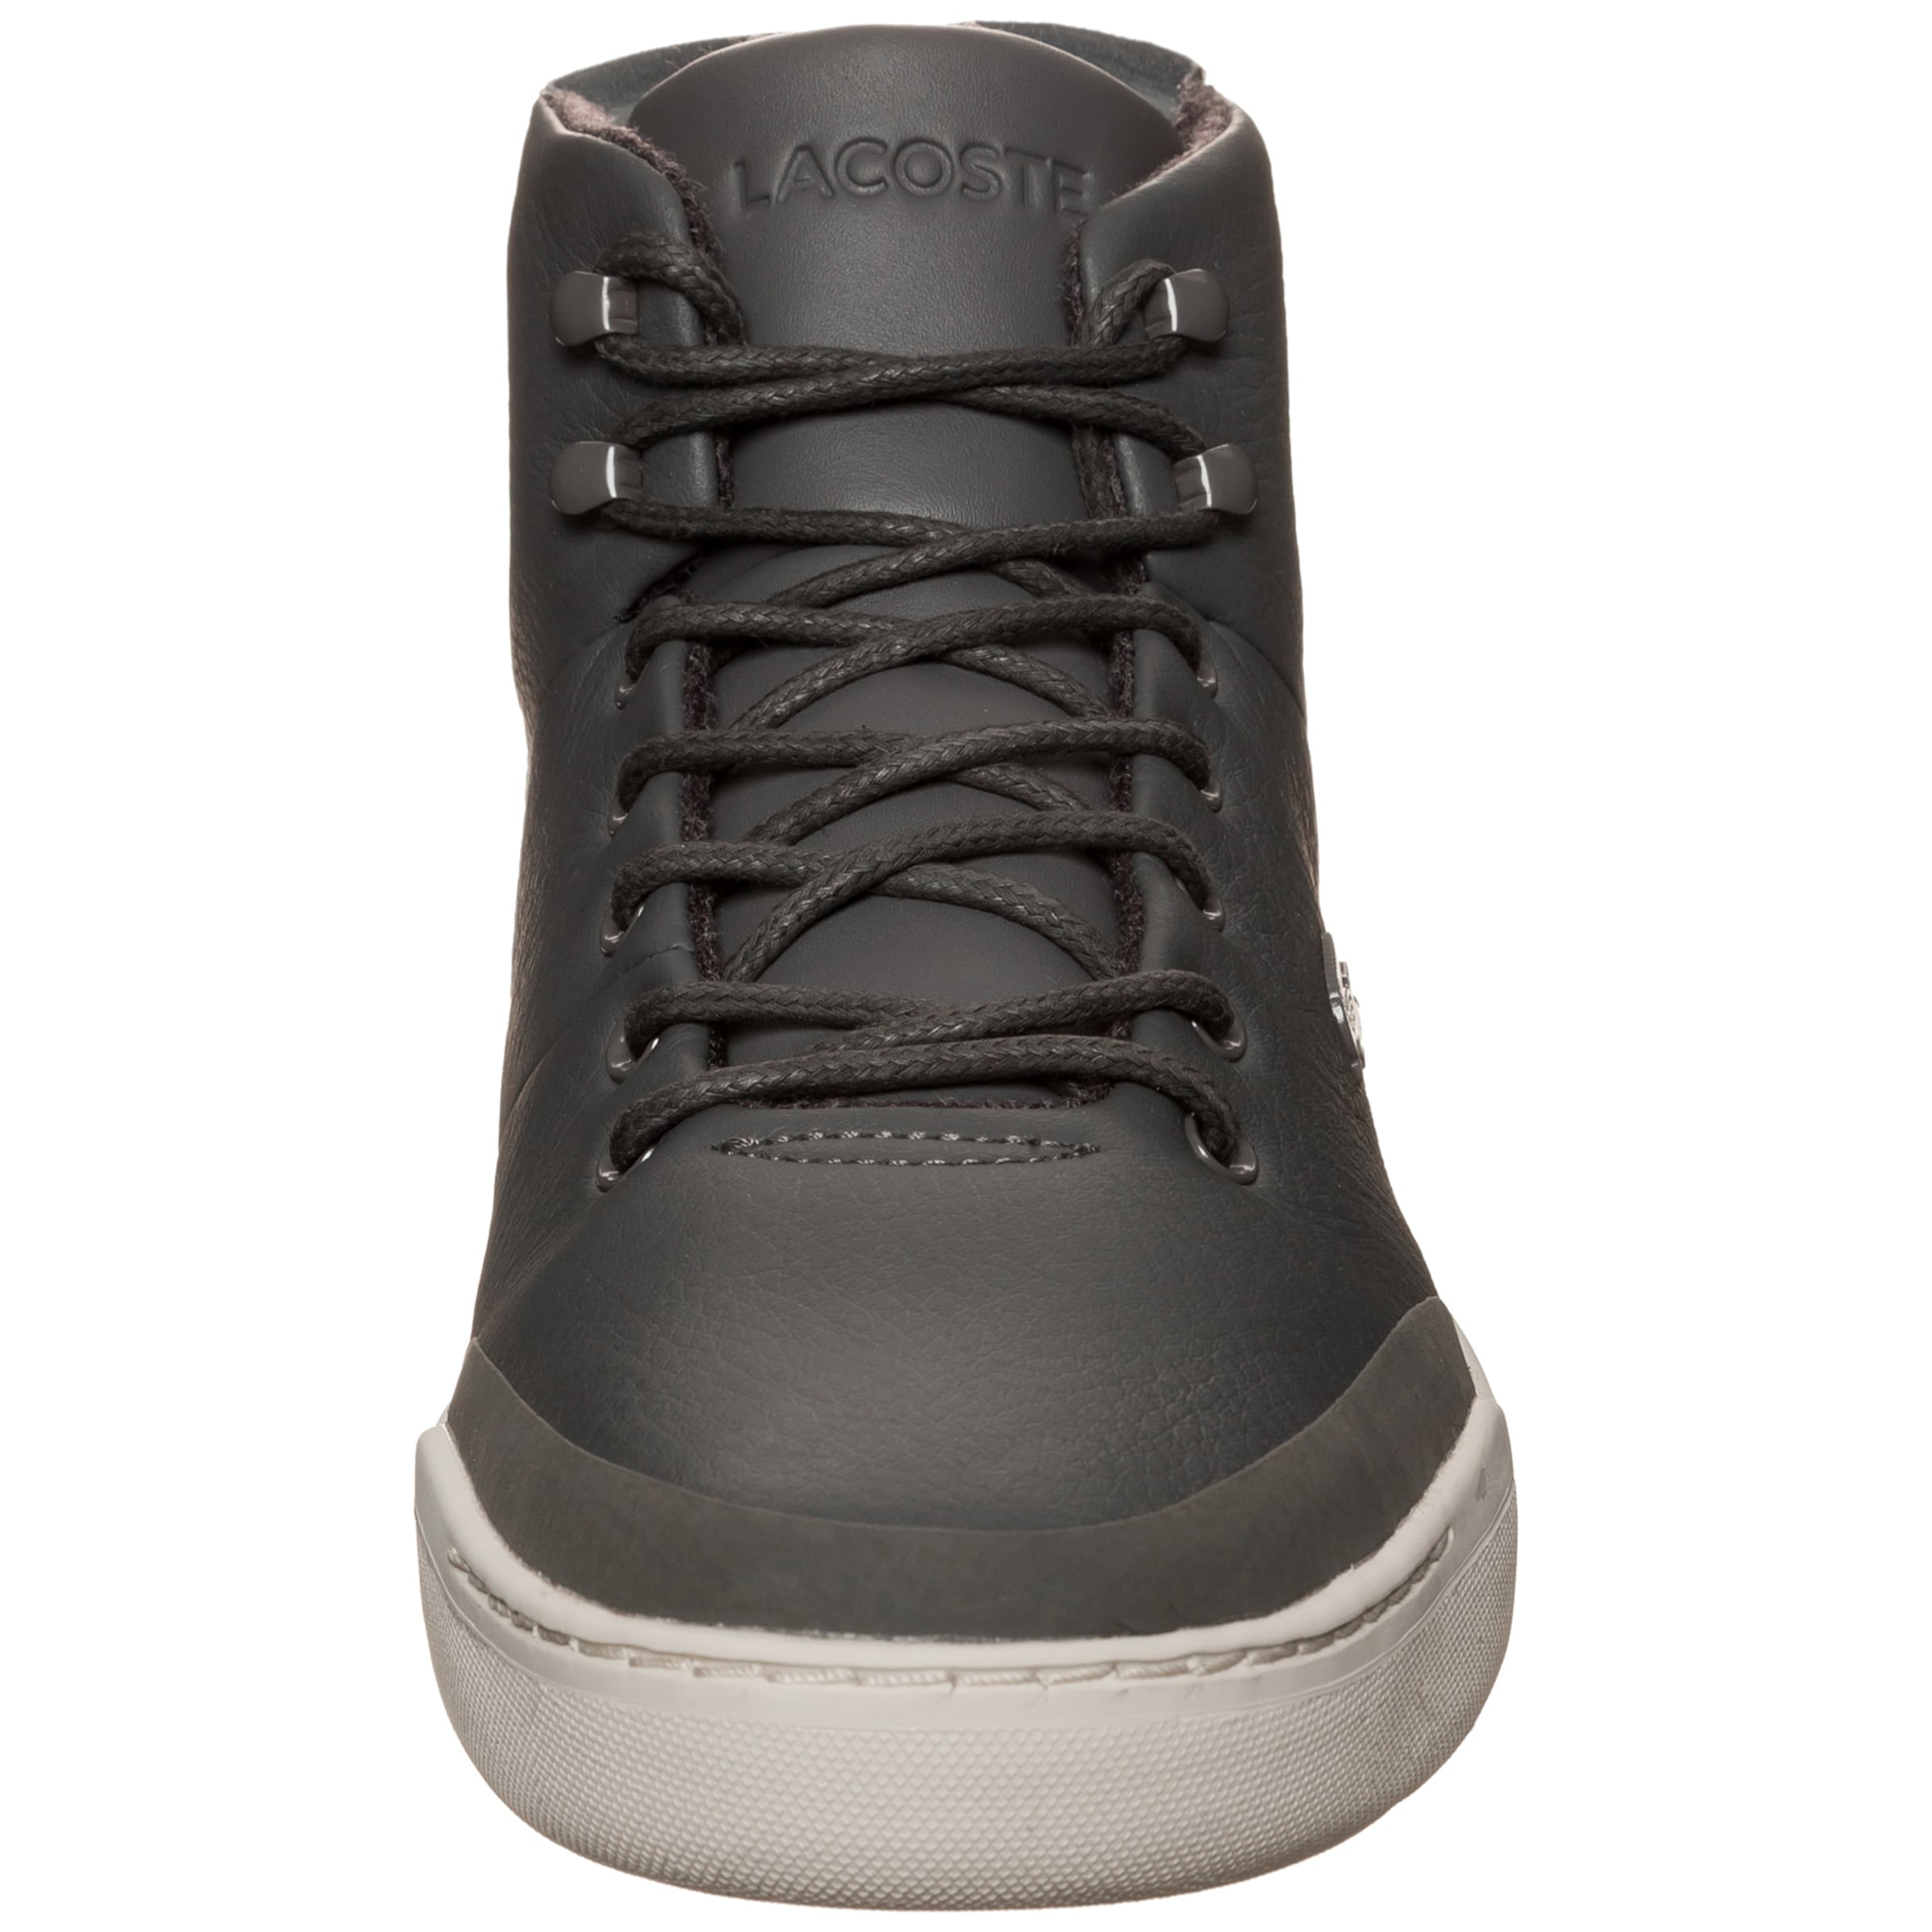 Clas Explorateur In Herren Lacoste Sneaker Grau gI6vYmbf7y